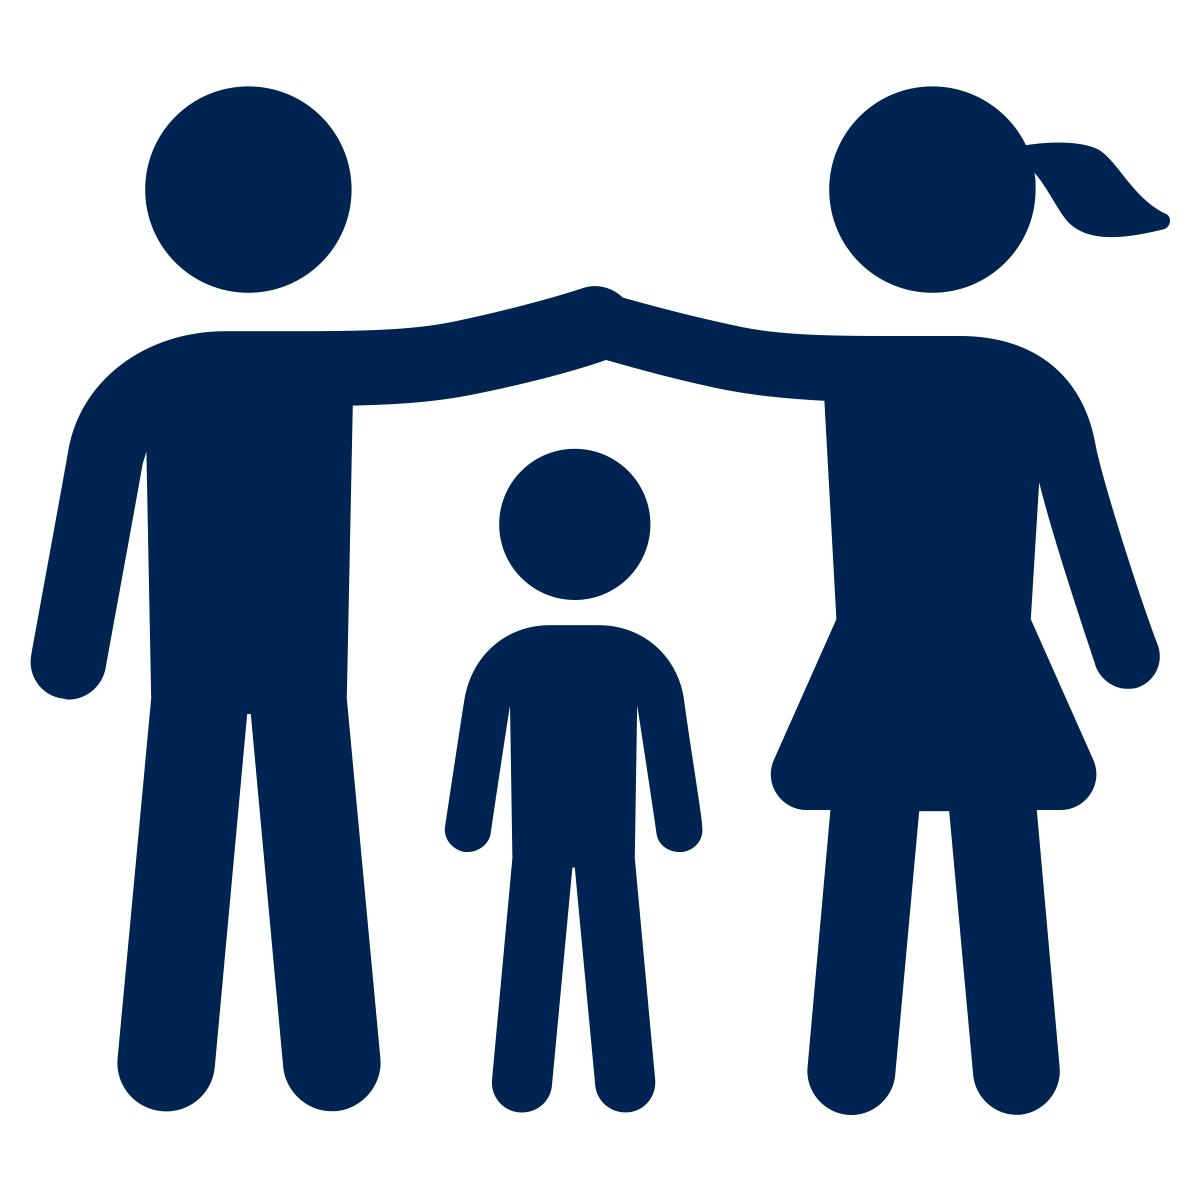 noun_Family_1201401_002451.png